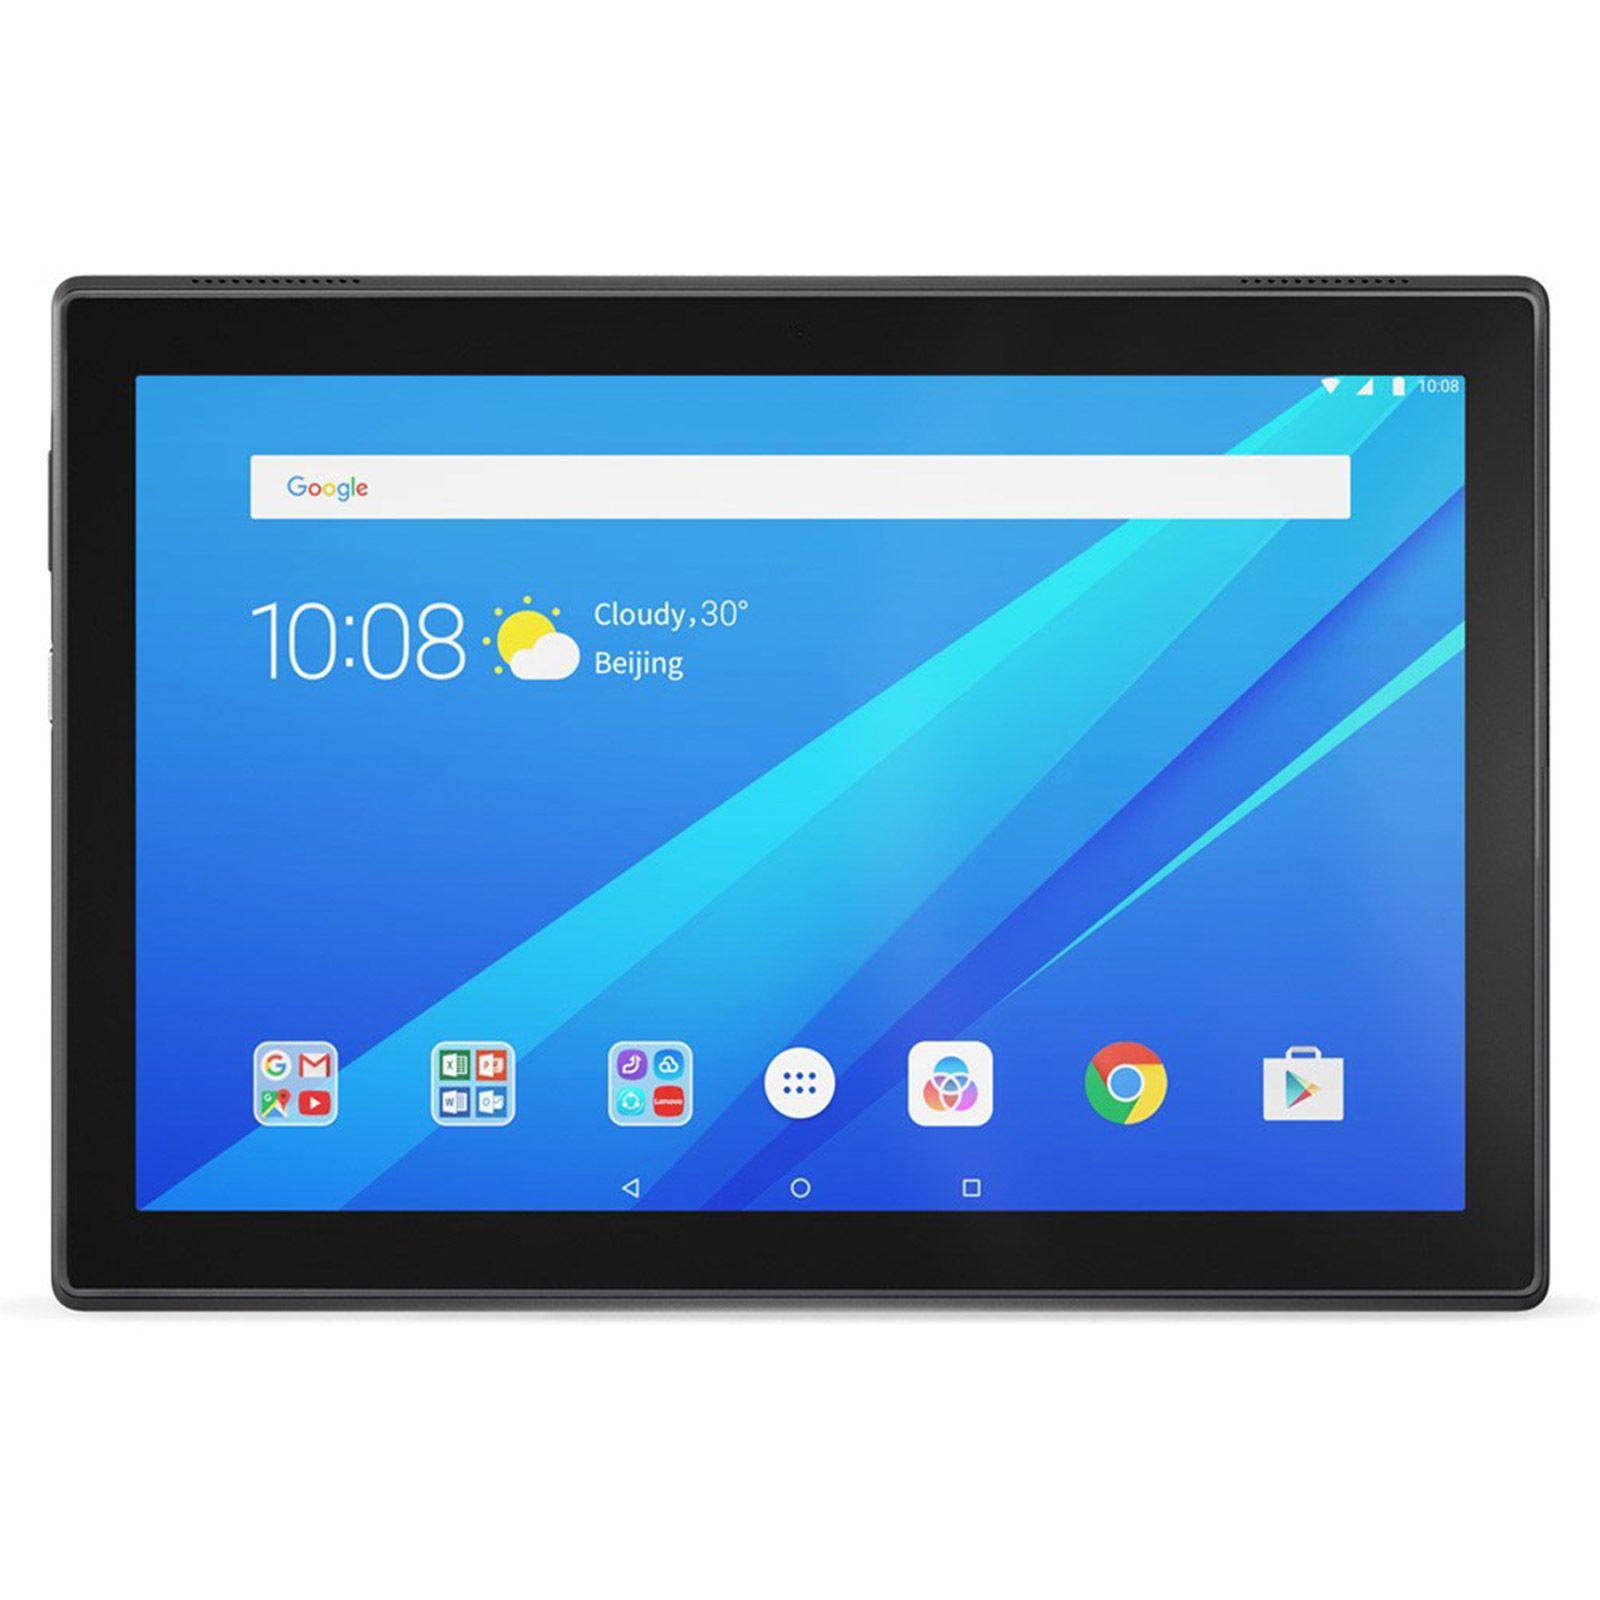 تبلت لنوو مدل Tab 4 TBX304 4G (سفید) Tablet, Android